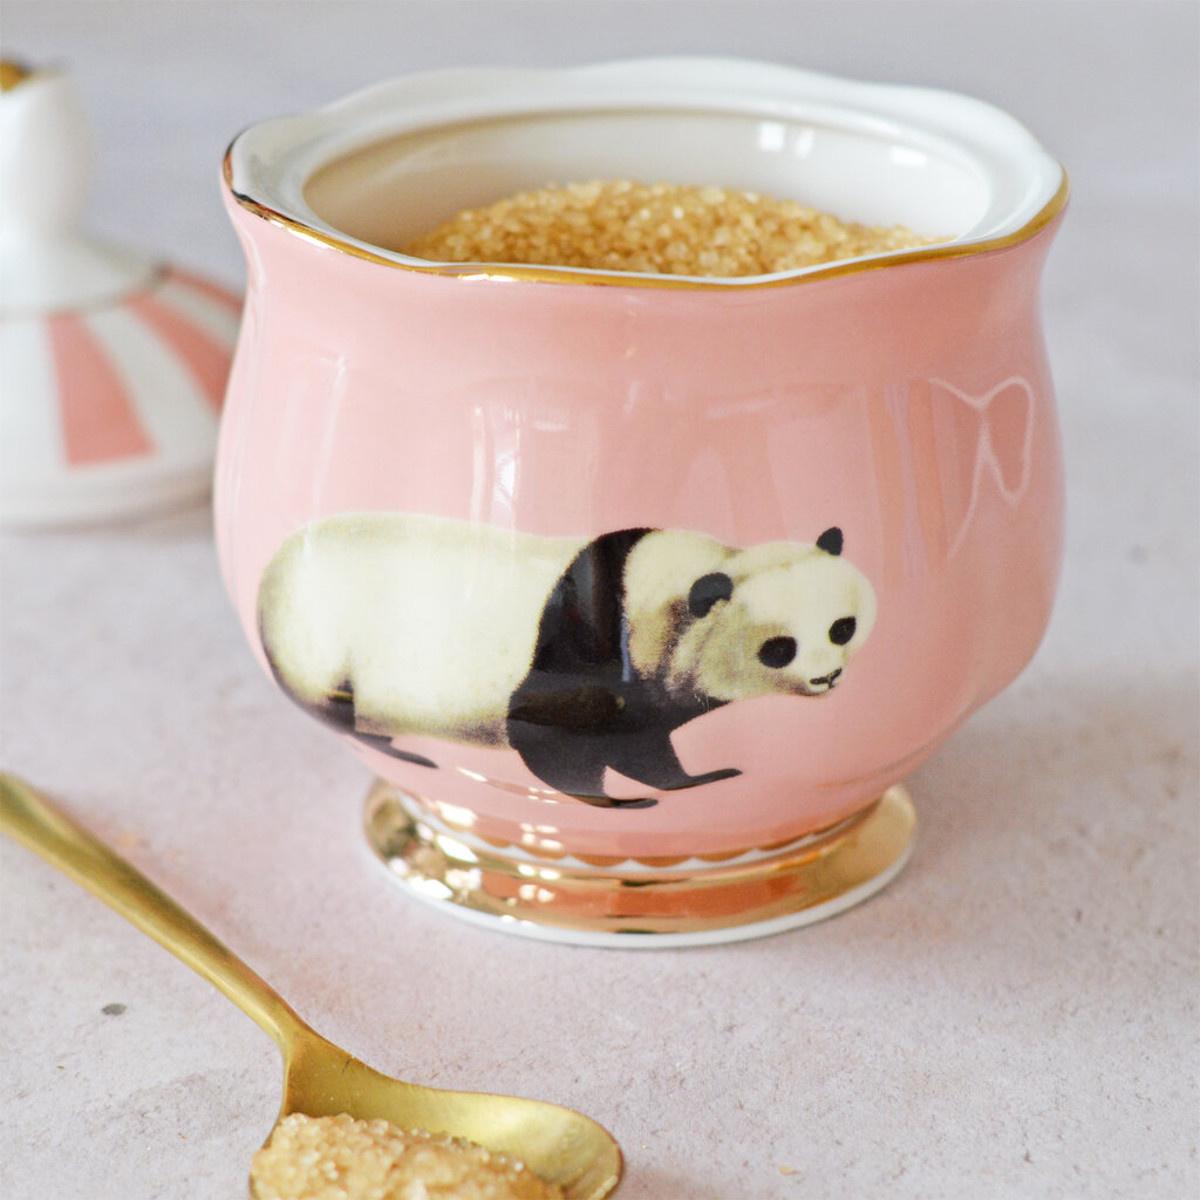 Yvonne Ellen London Yvonne Ellen - Carnival Animal  - Zuckerdose - Panda - Bone China Porzellan